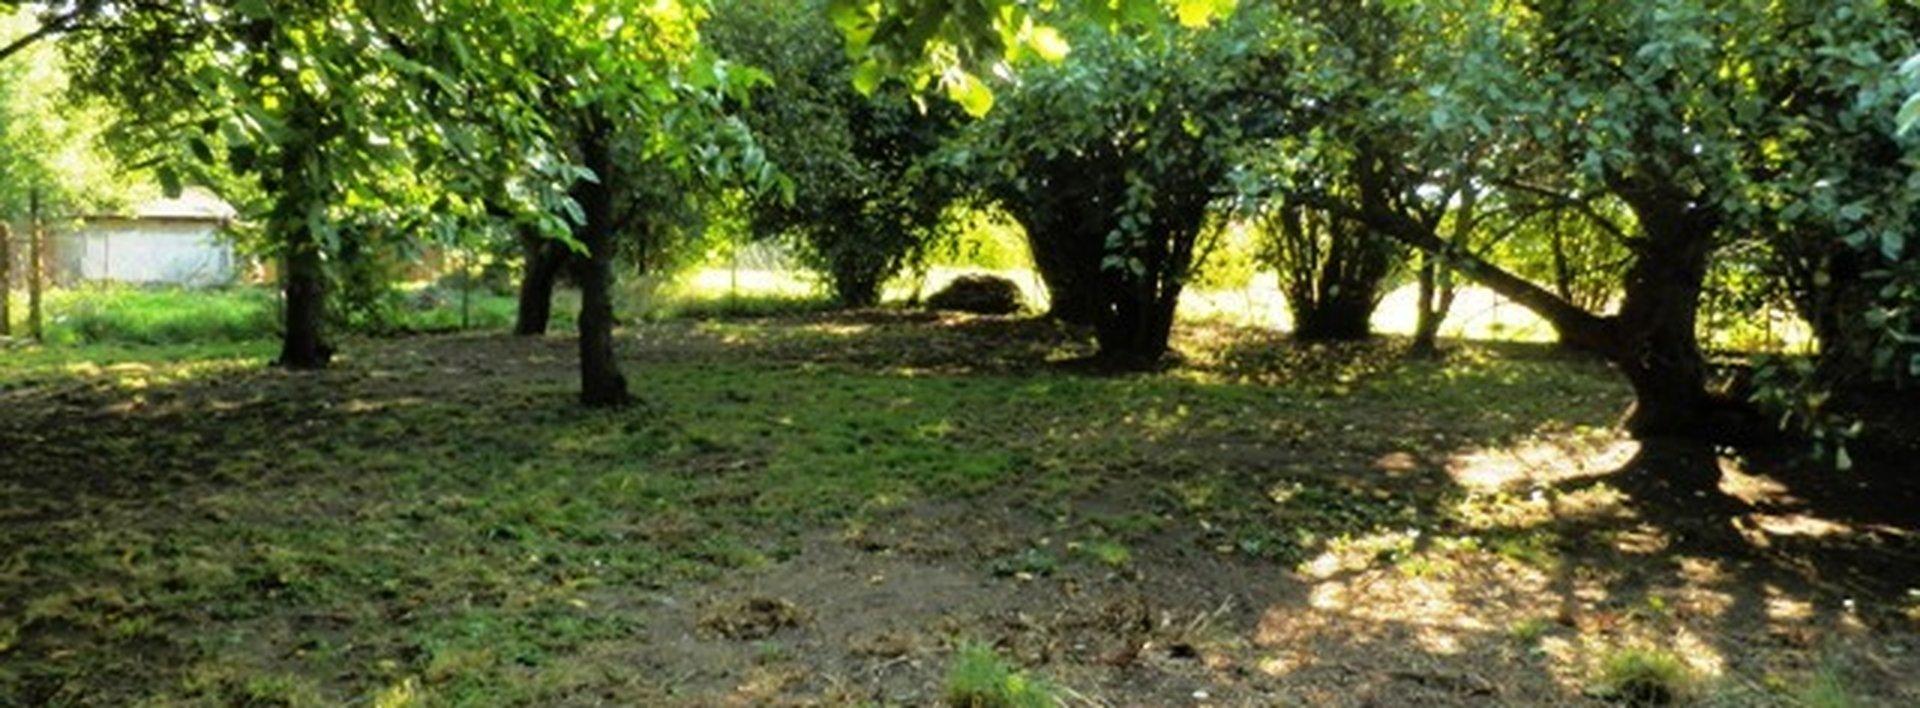 Prodej výjimečného pozemku na okraji Lázní Bohdaneč, 1317 m2, Ev.č.: N47423